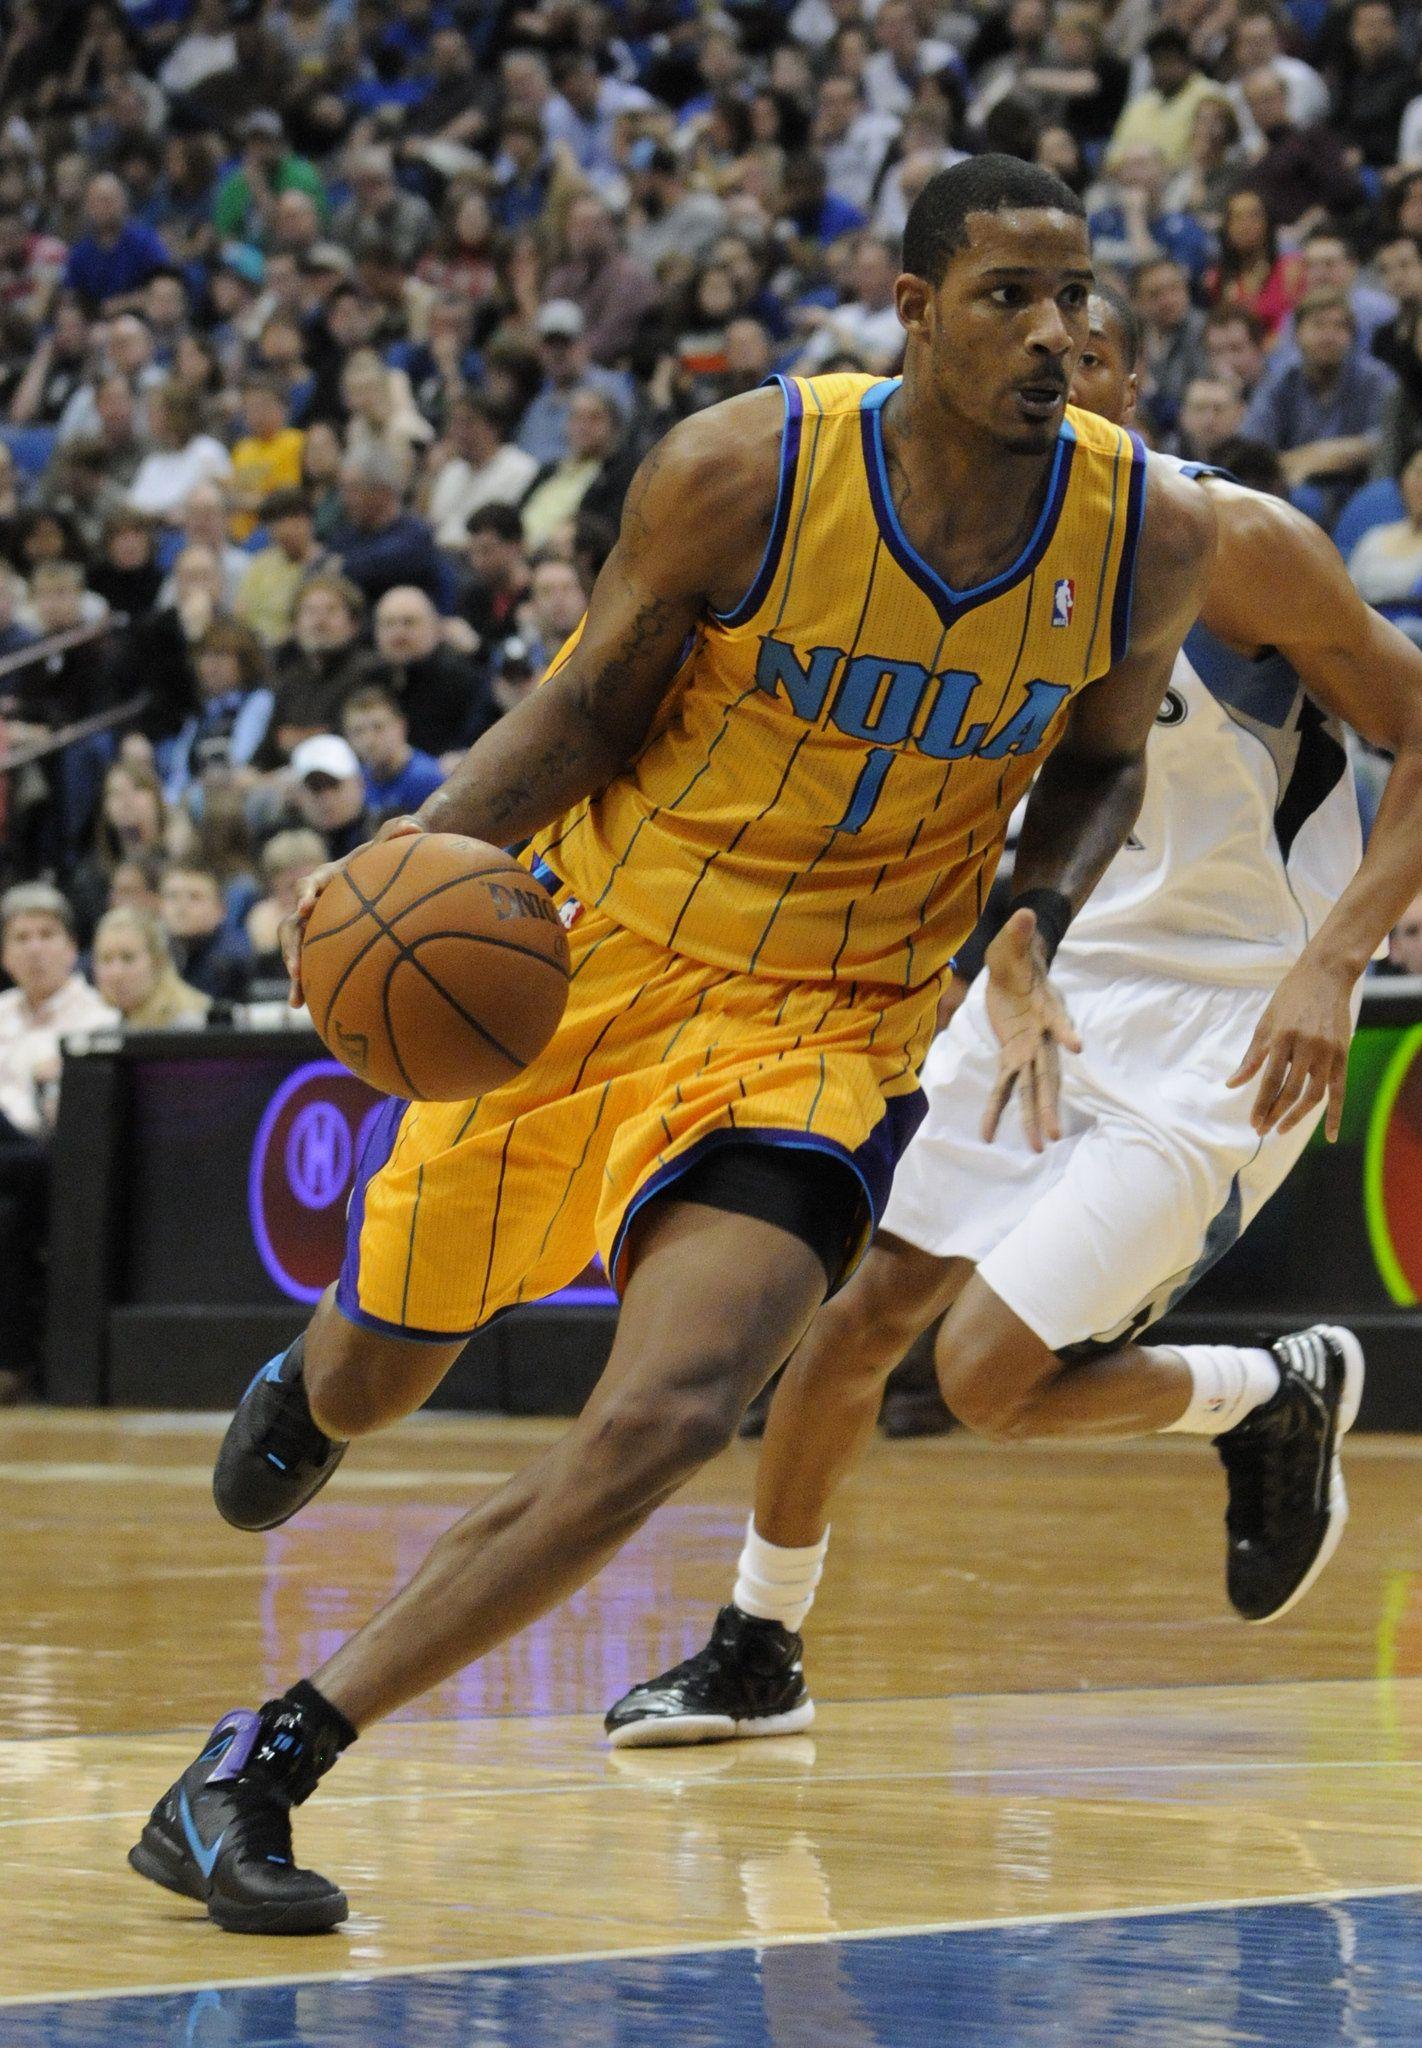 NBA Small Forward Trevor Ariza is of Dominican and Turks and Caicos Islander origin.